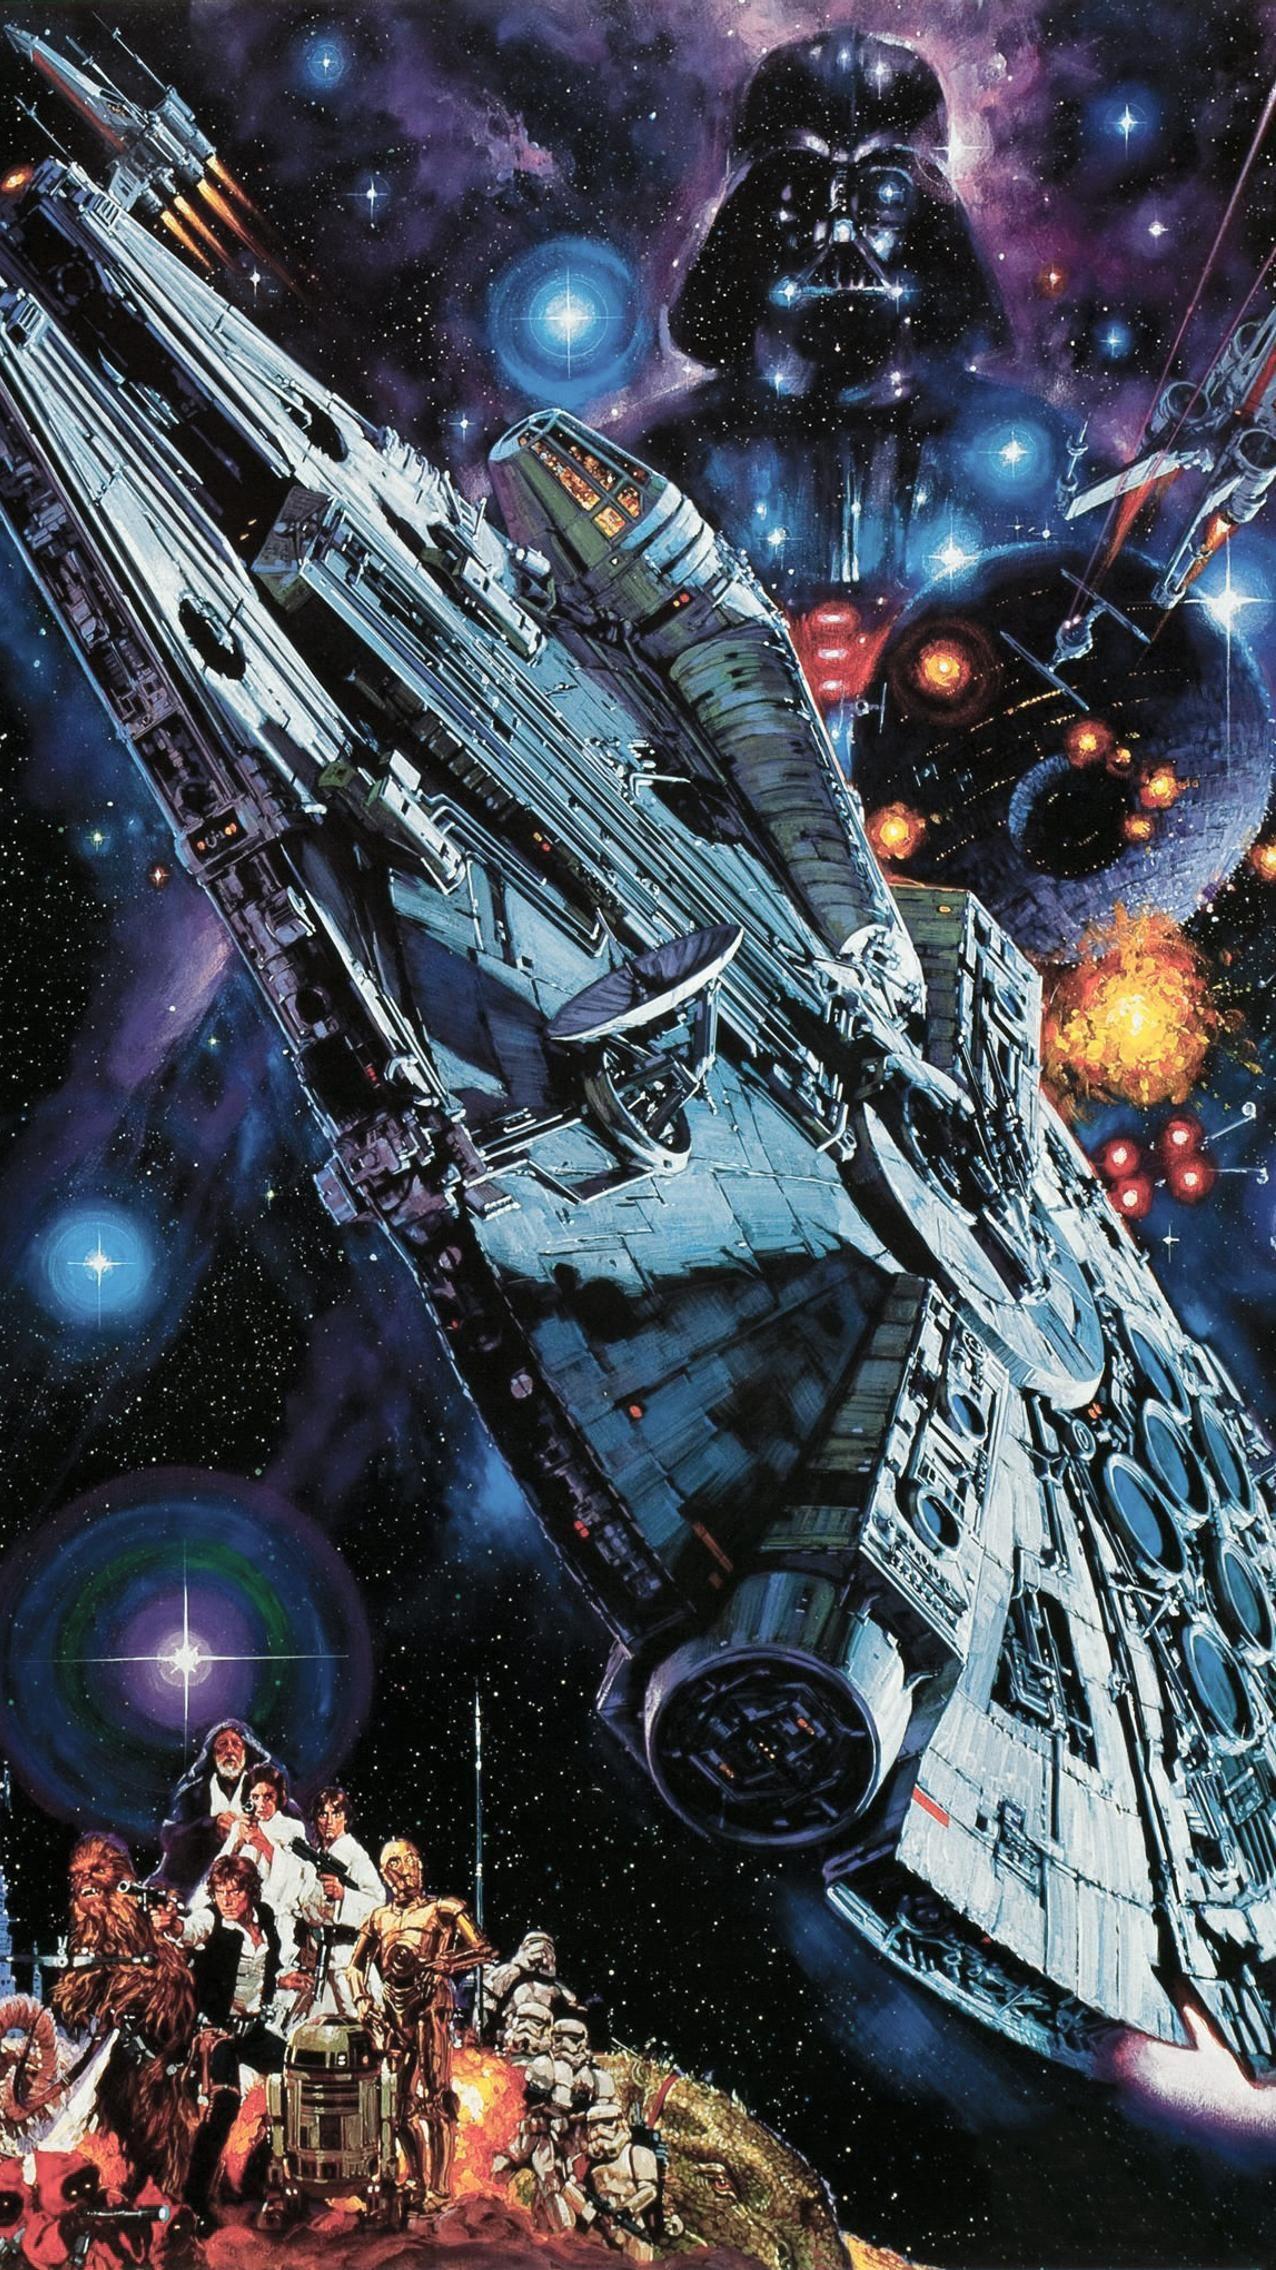 Avengers Endgame 2019 Phone Wallpaper Moviemania Star Wars Images Star Wars Wallpaper Iphone Star Wars Wallpaper